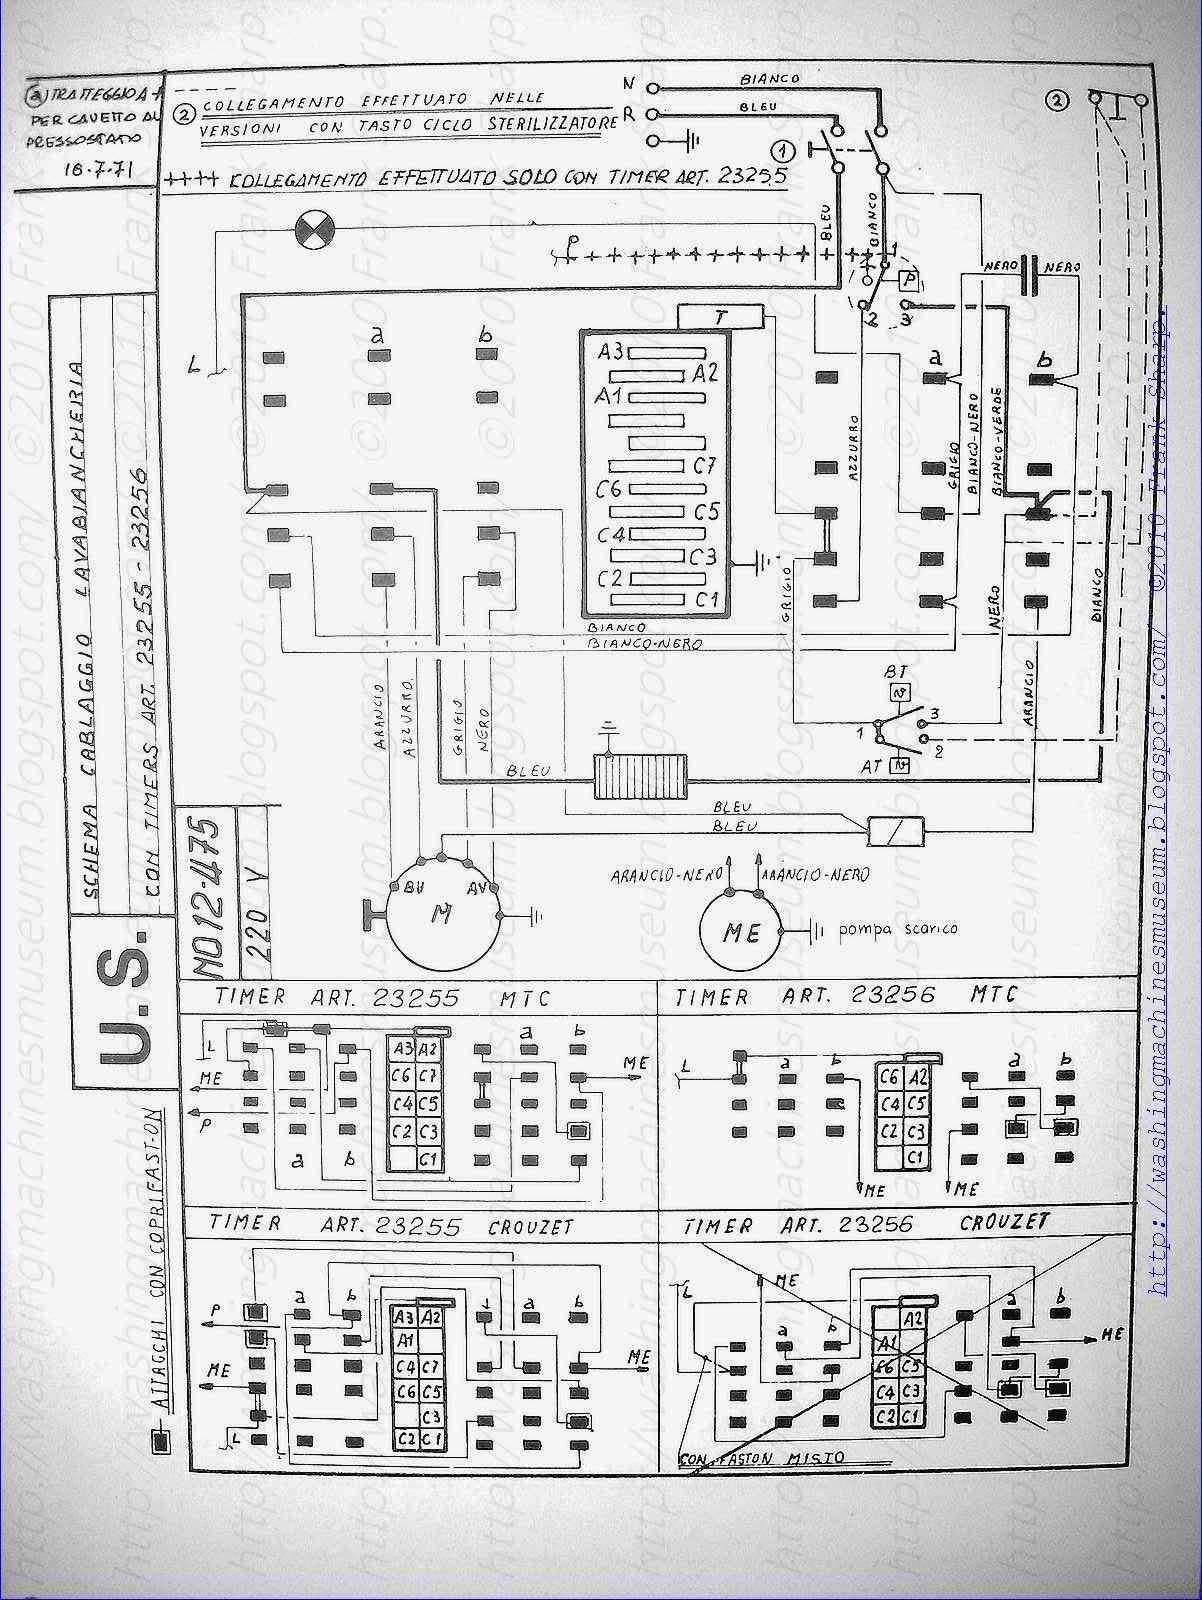 Washer Rama Museum: CANDY WASHING MACHINE WITH TIMER